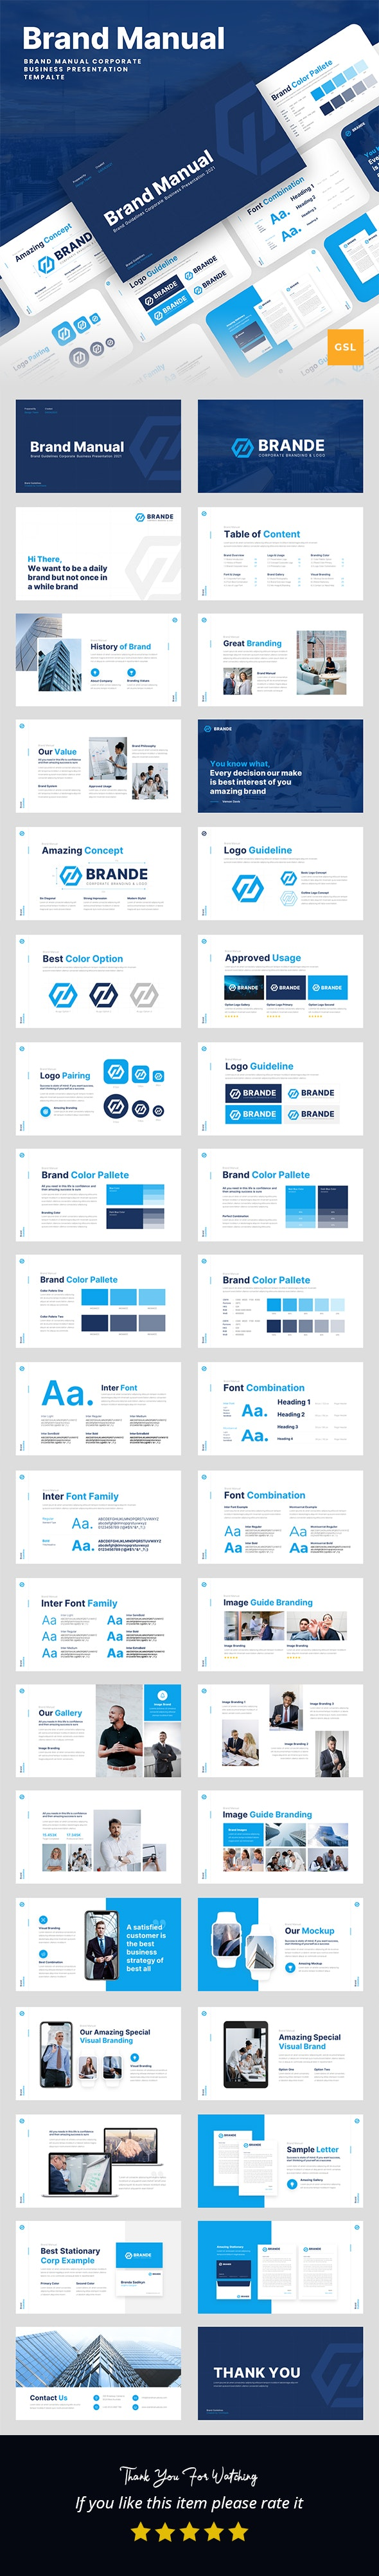 Brand Manual Google Slides Presentation Template - Google Slides Presentation Templates